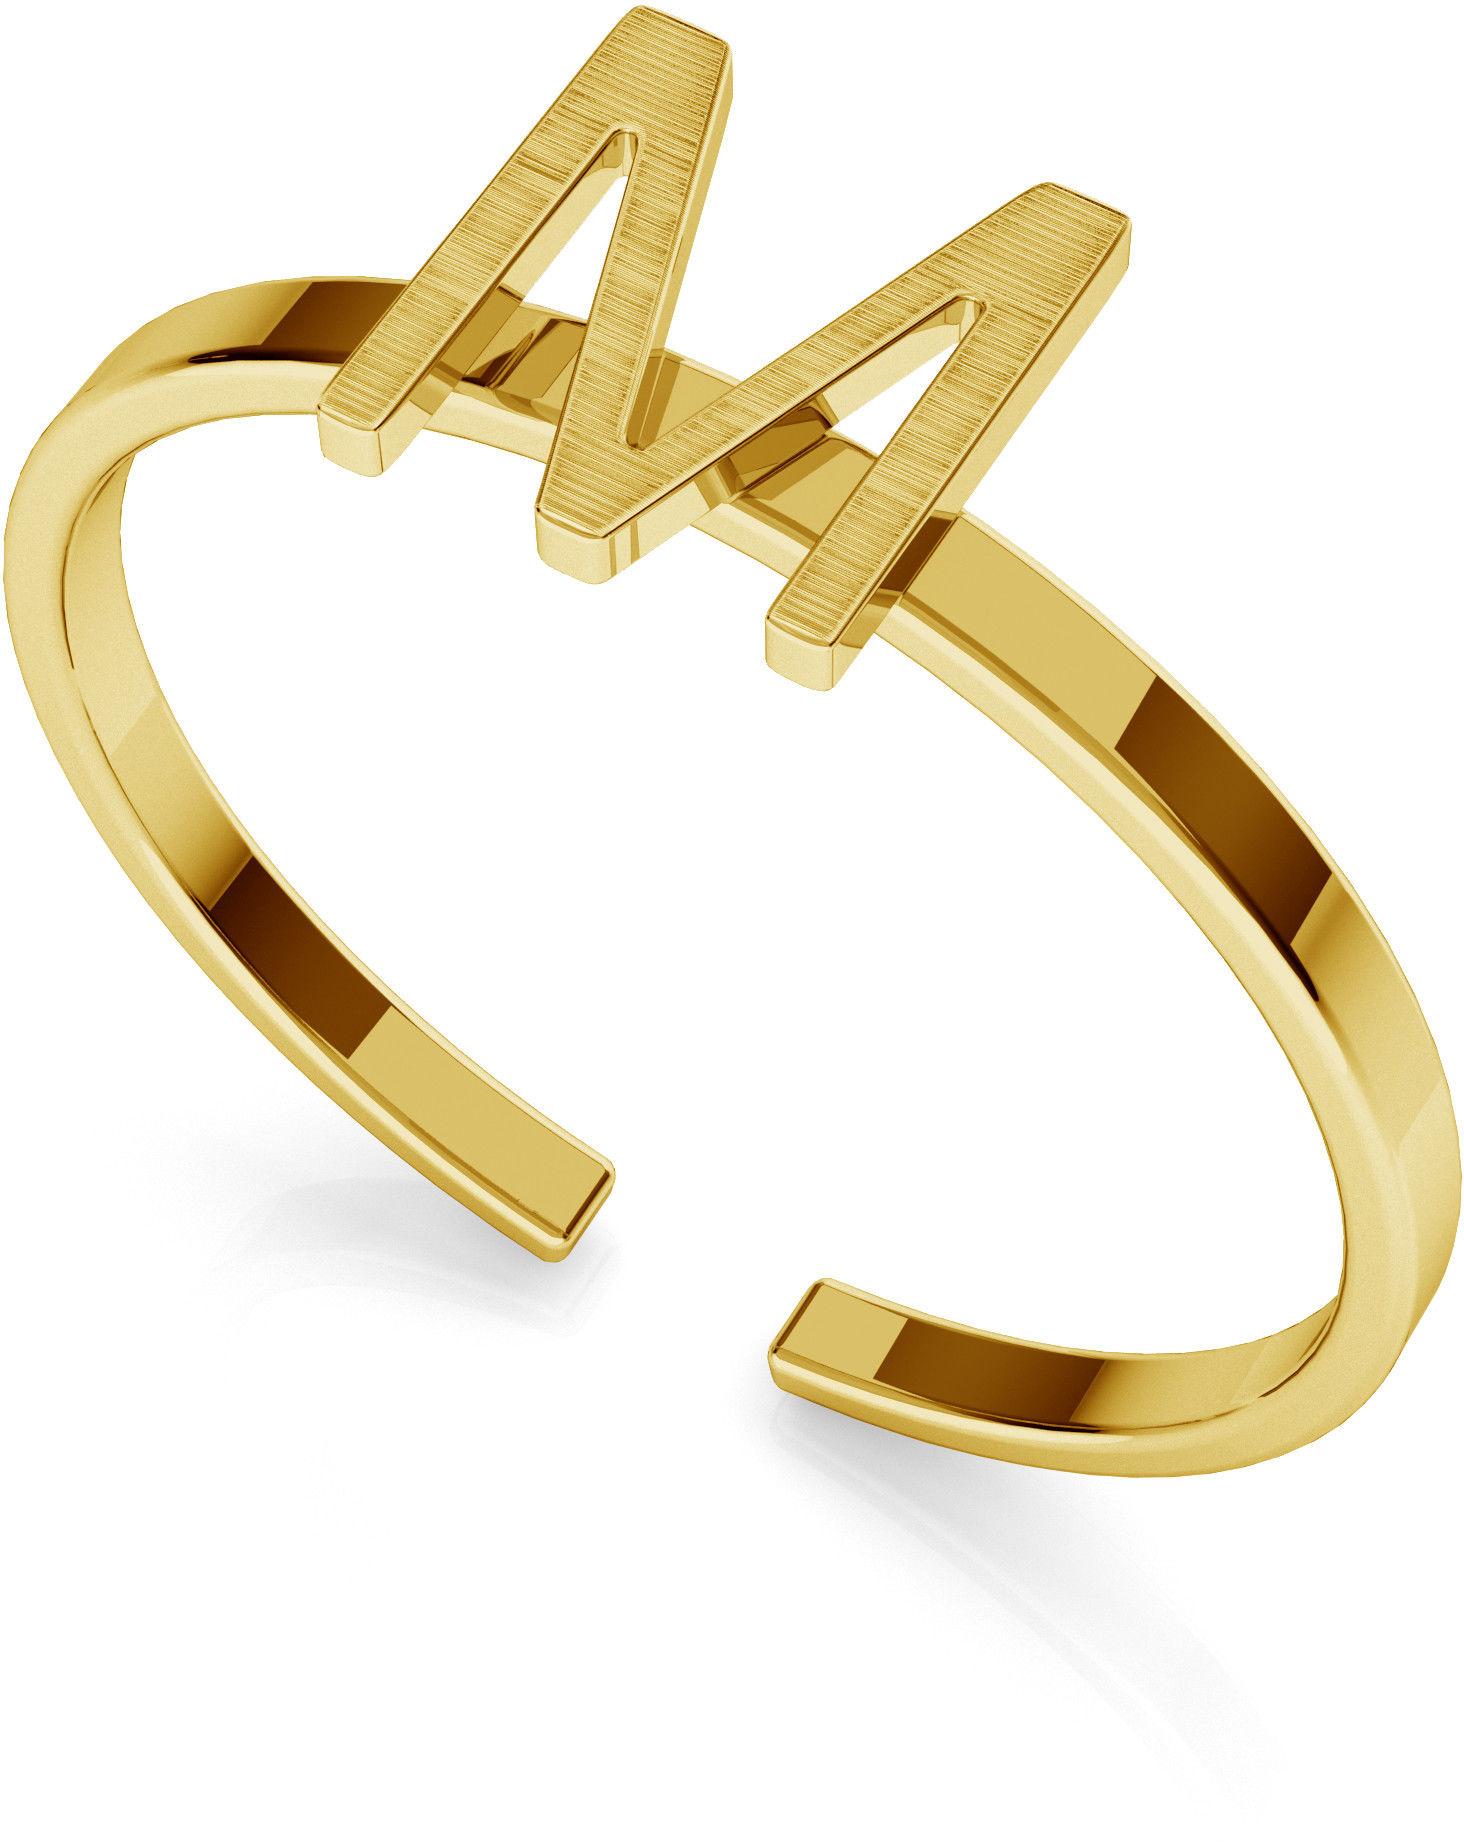 Srebrny pierścionek z literką My RING, srebro 925 : Litera - J, Srebro - kolor pokrycia - Pokrycie platyną